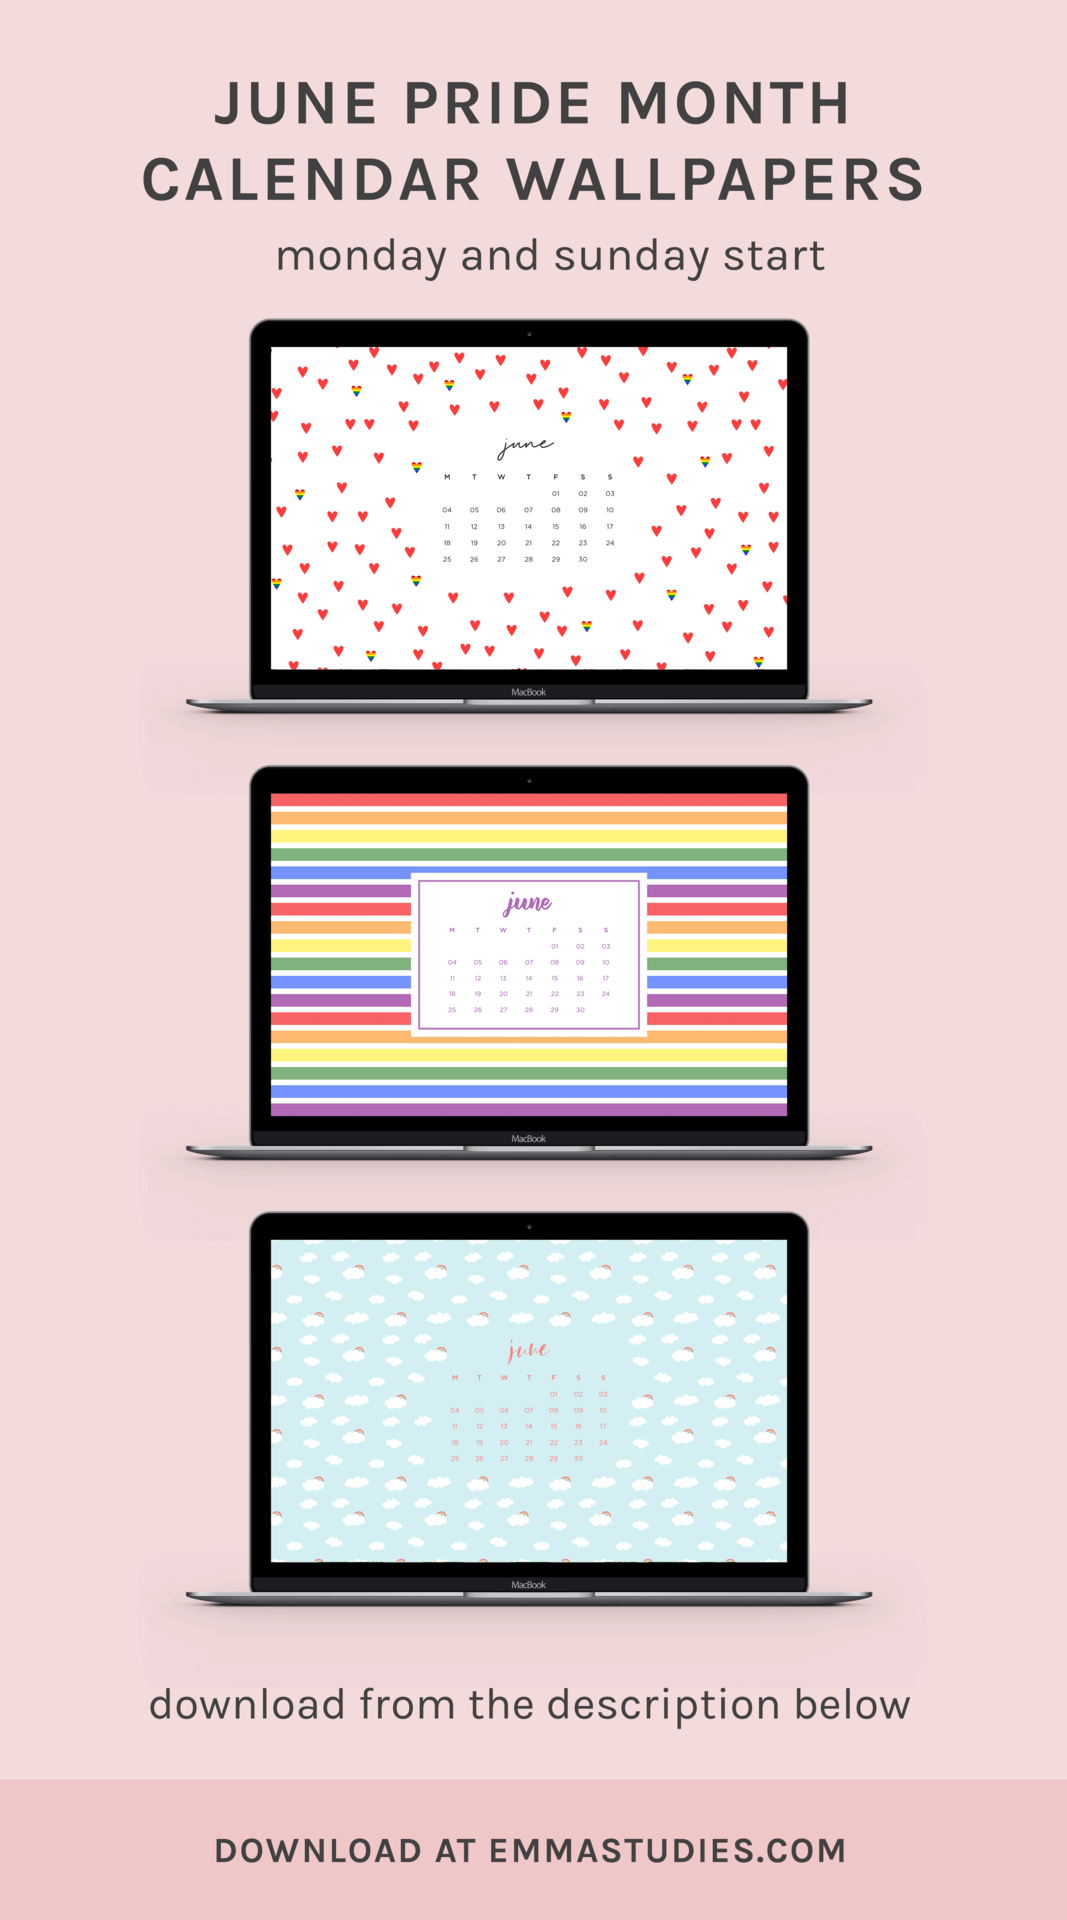 Pride Month Calendar 2019.June Pride Month Calendar Desktop Wallpapers Emmastudies Art